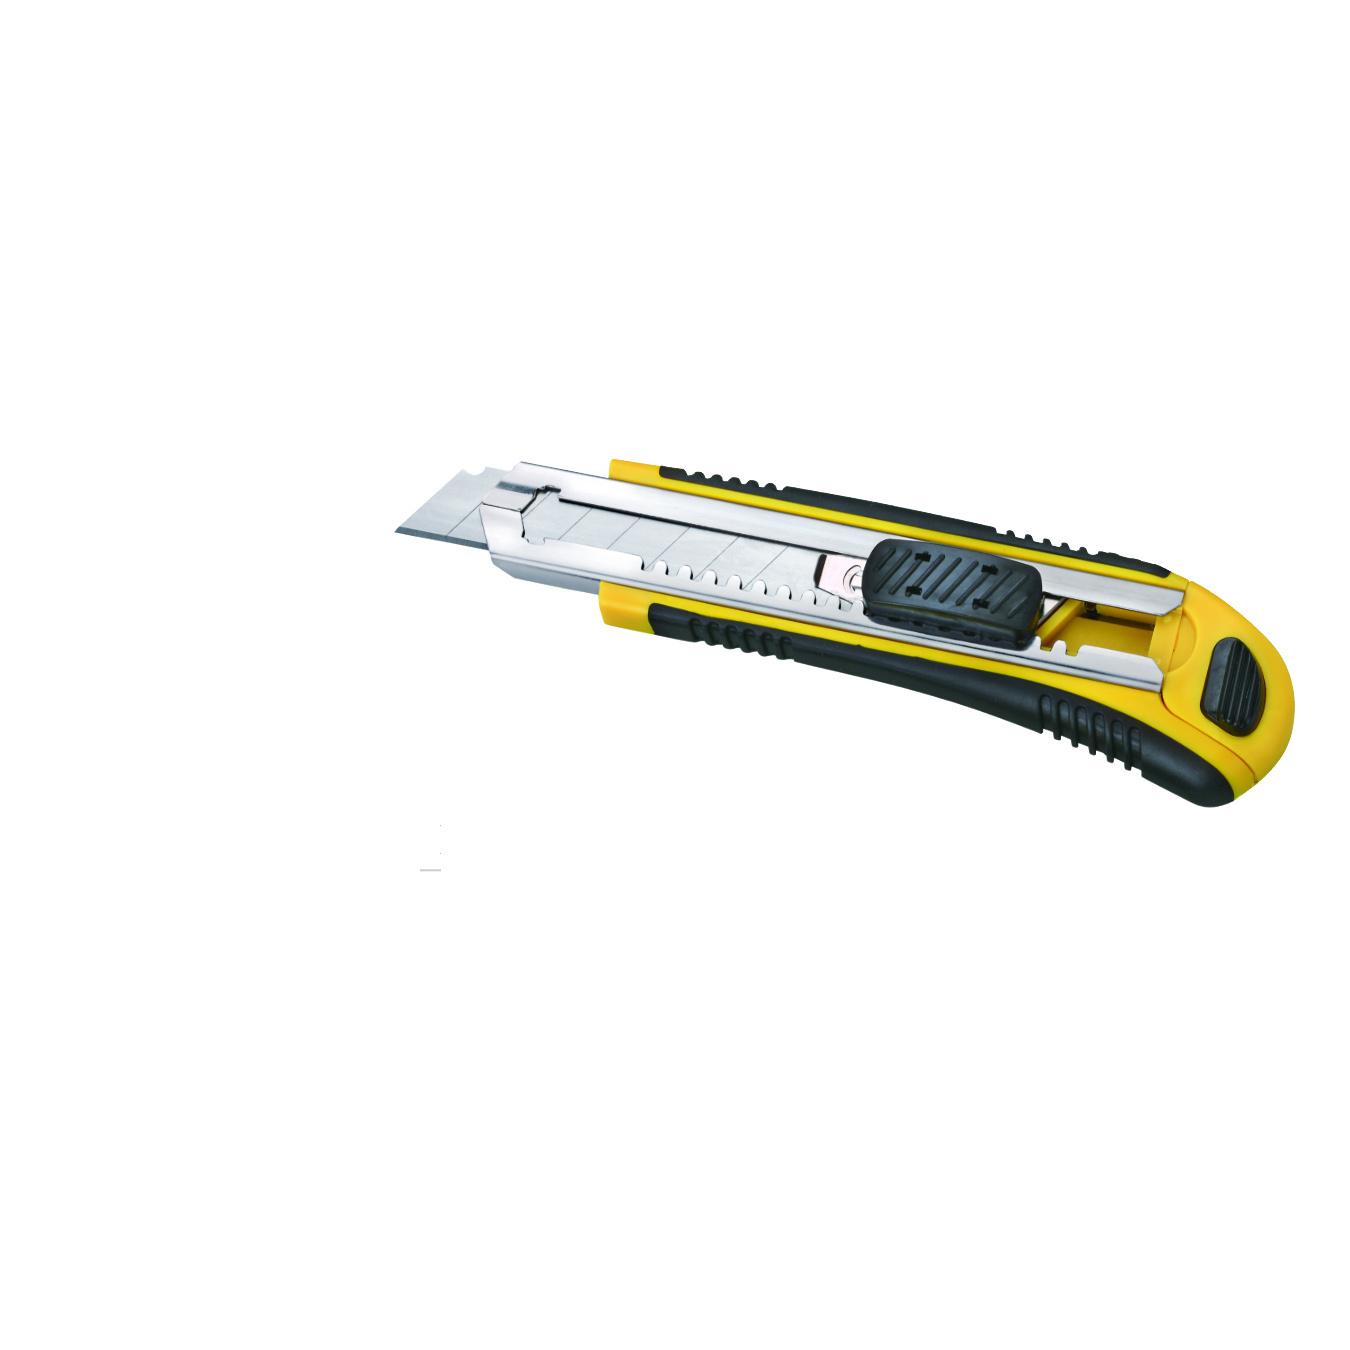 Auto-Loading Utility Knife (NC29)